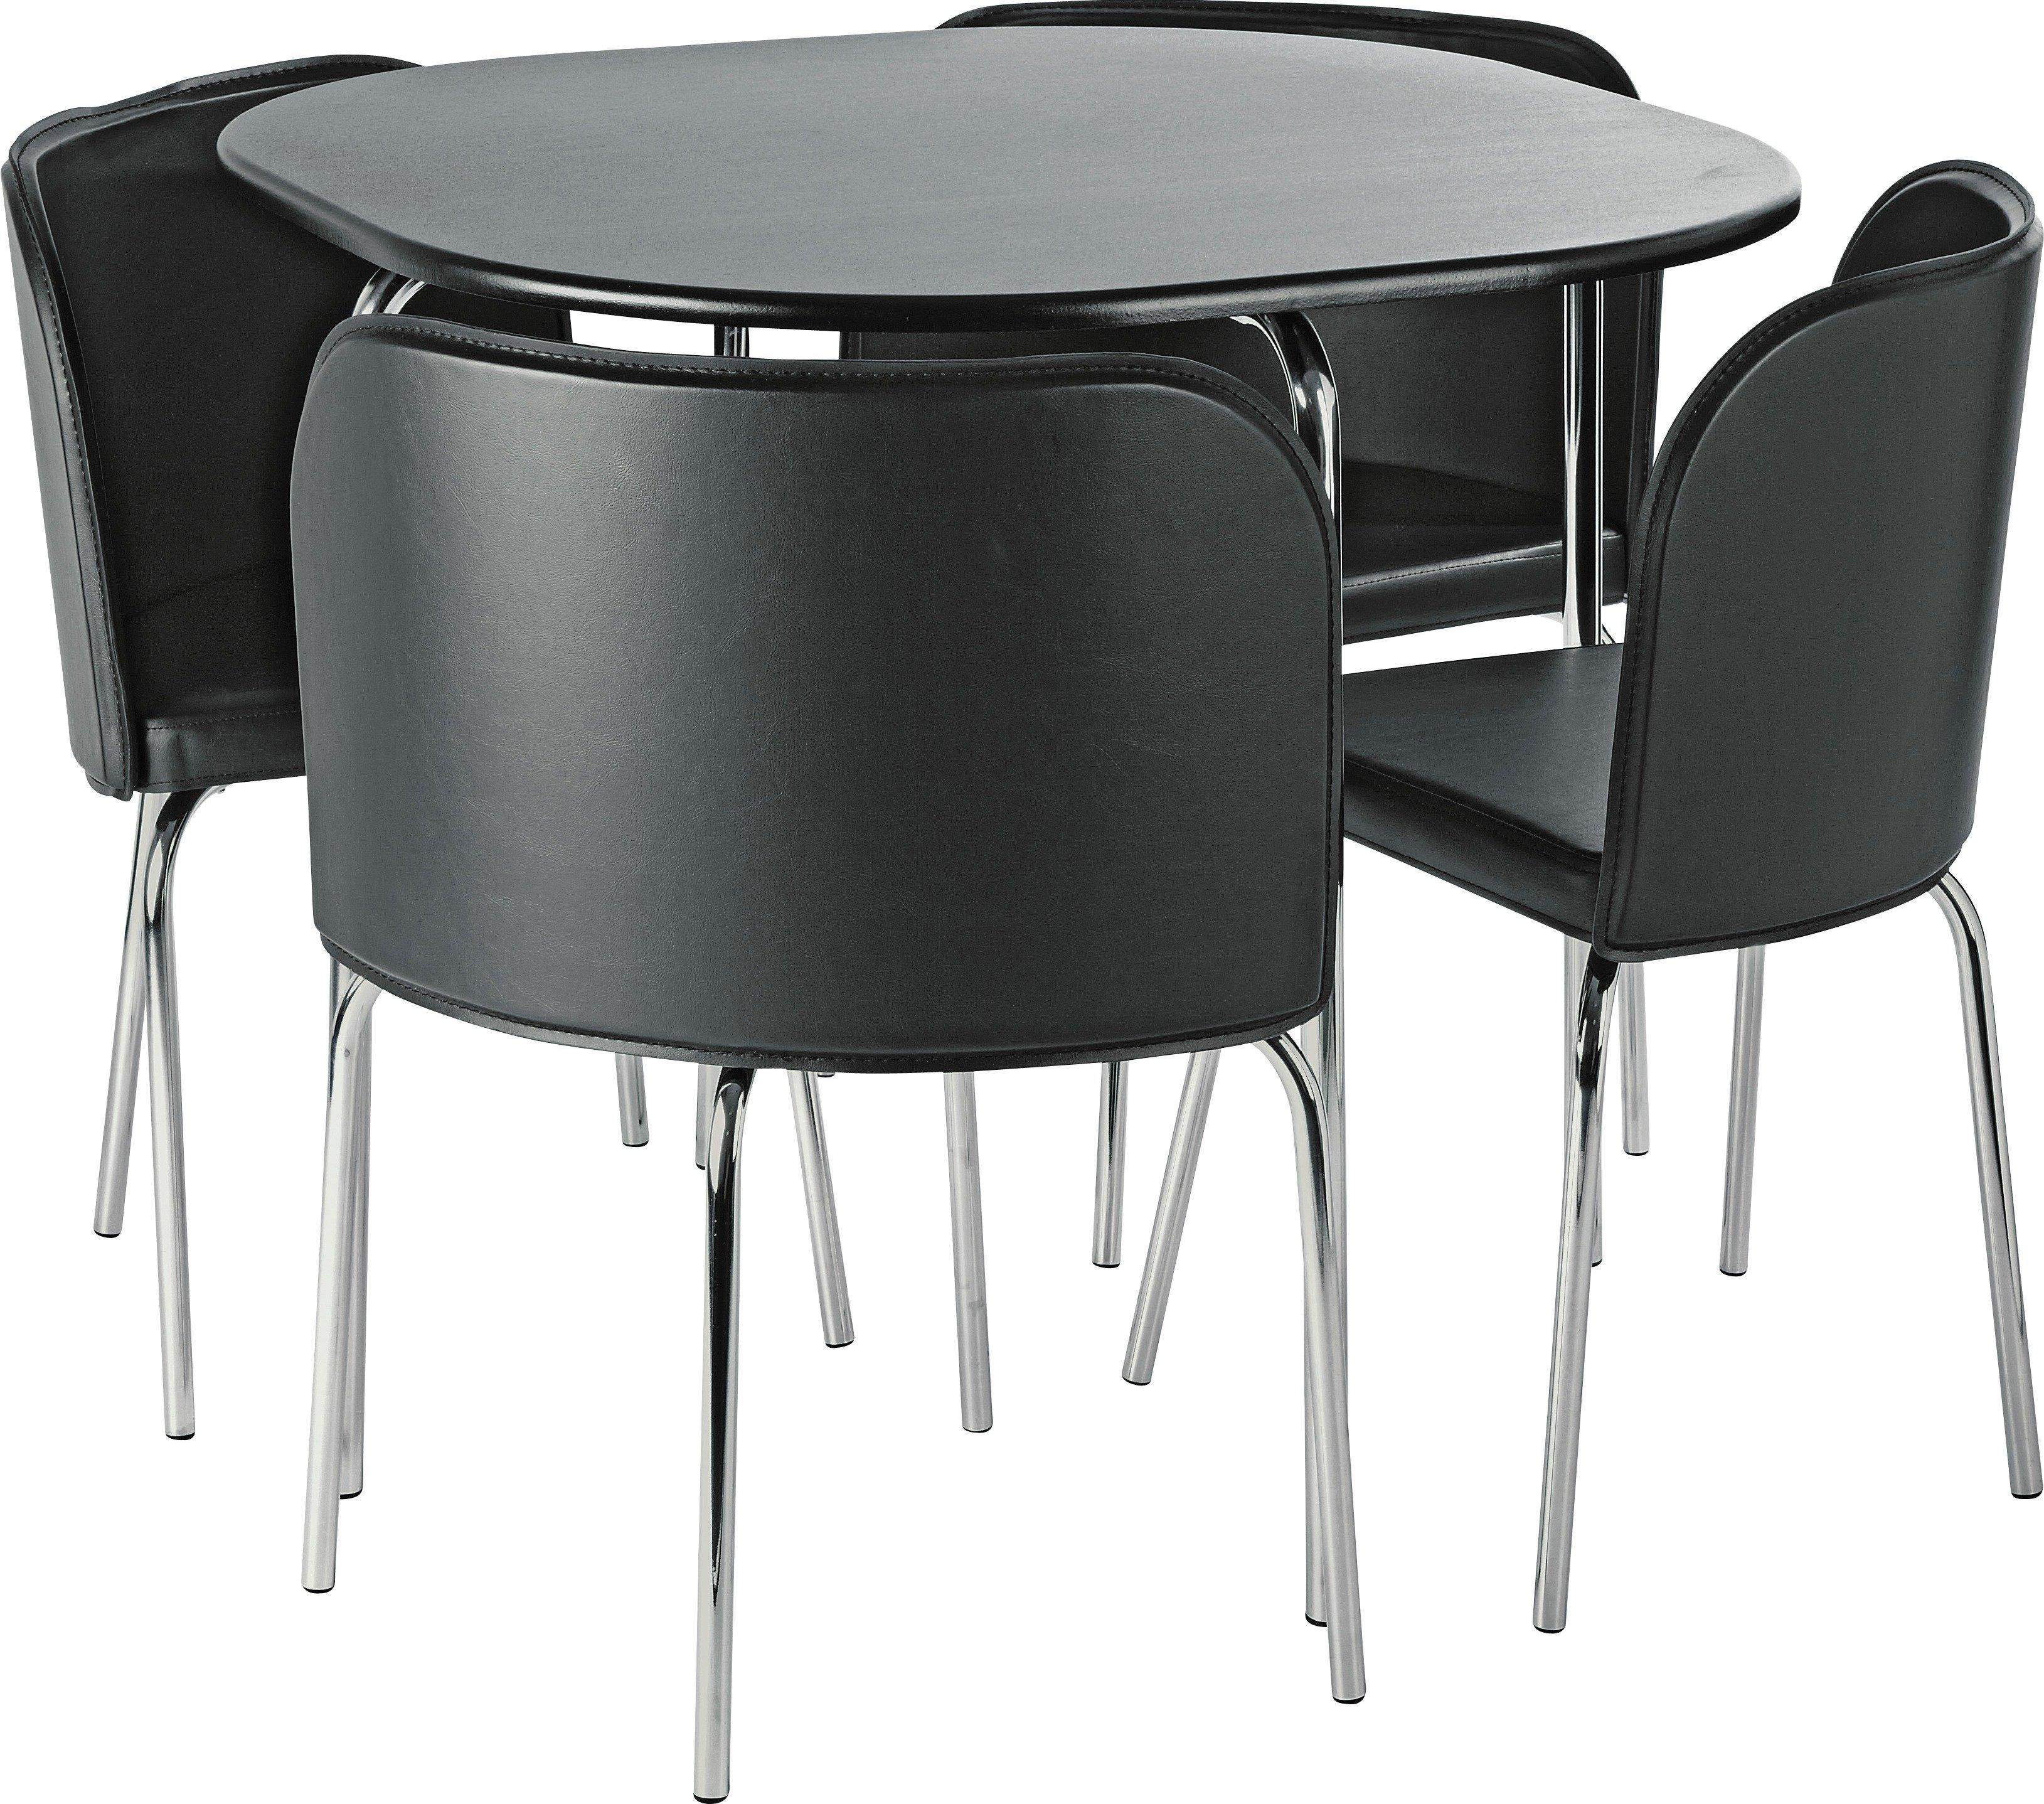 Hygena Amparo Dining Table U0026 4 Chairs   Black